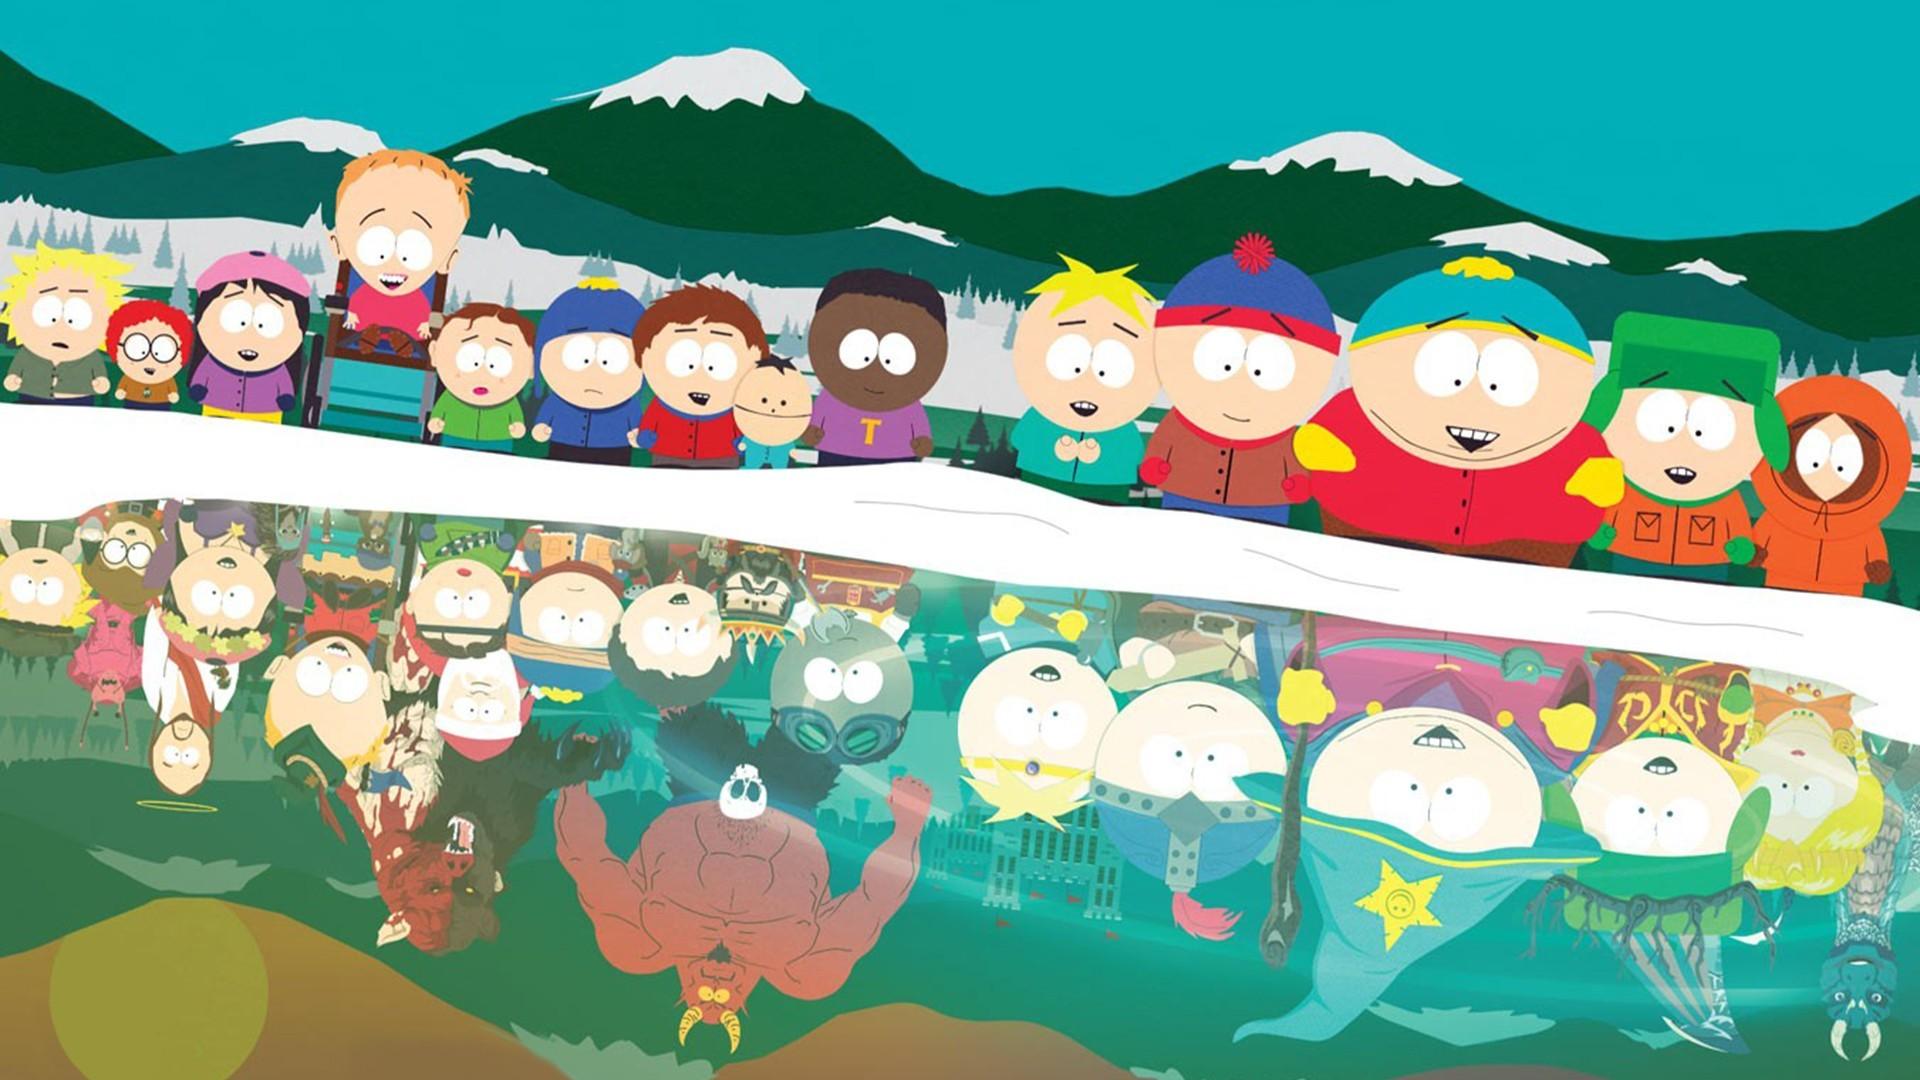 Wallpaper Ilustrasi Gambar Kartun South Park Stick Of Truth